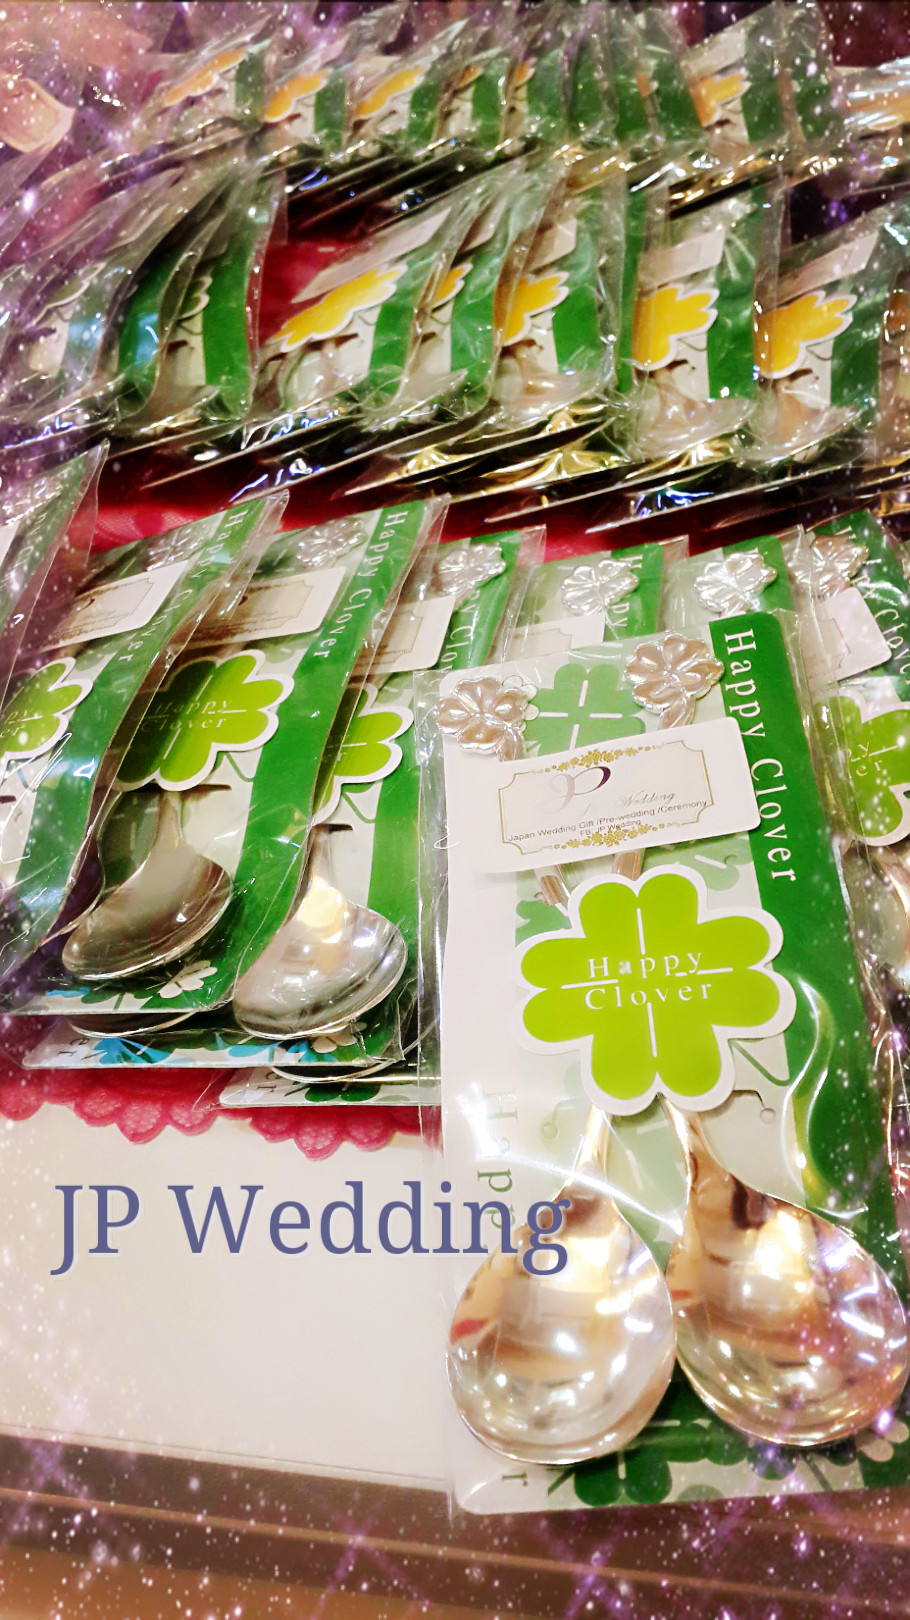 JP Wedding@wedding expo (26).jpg